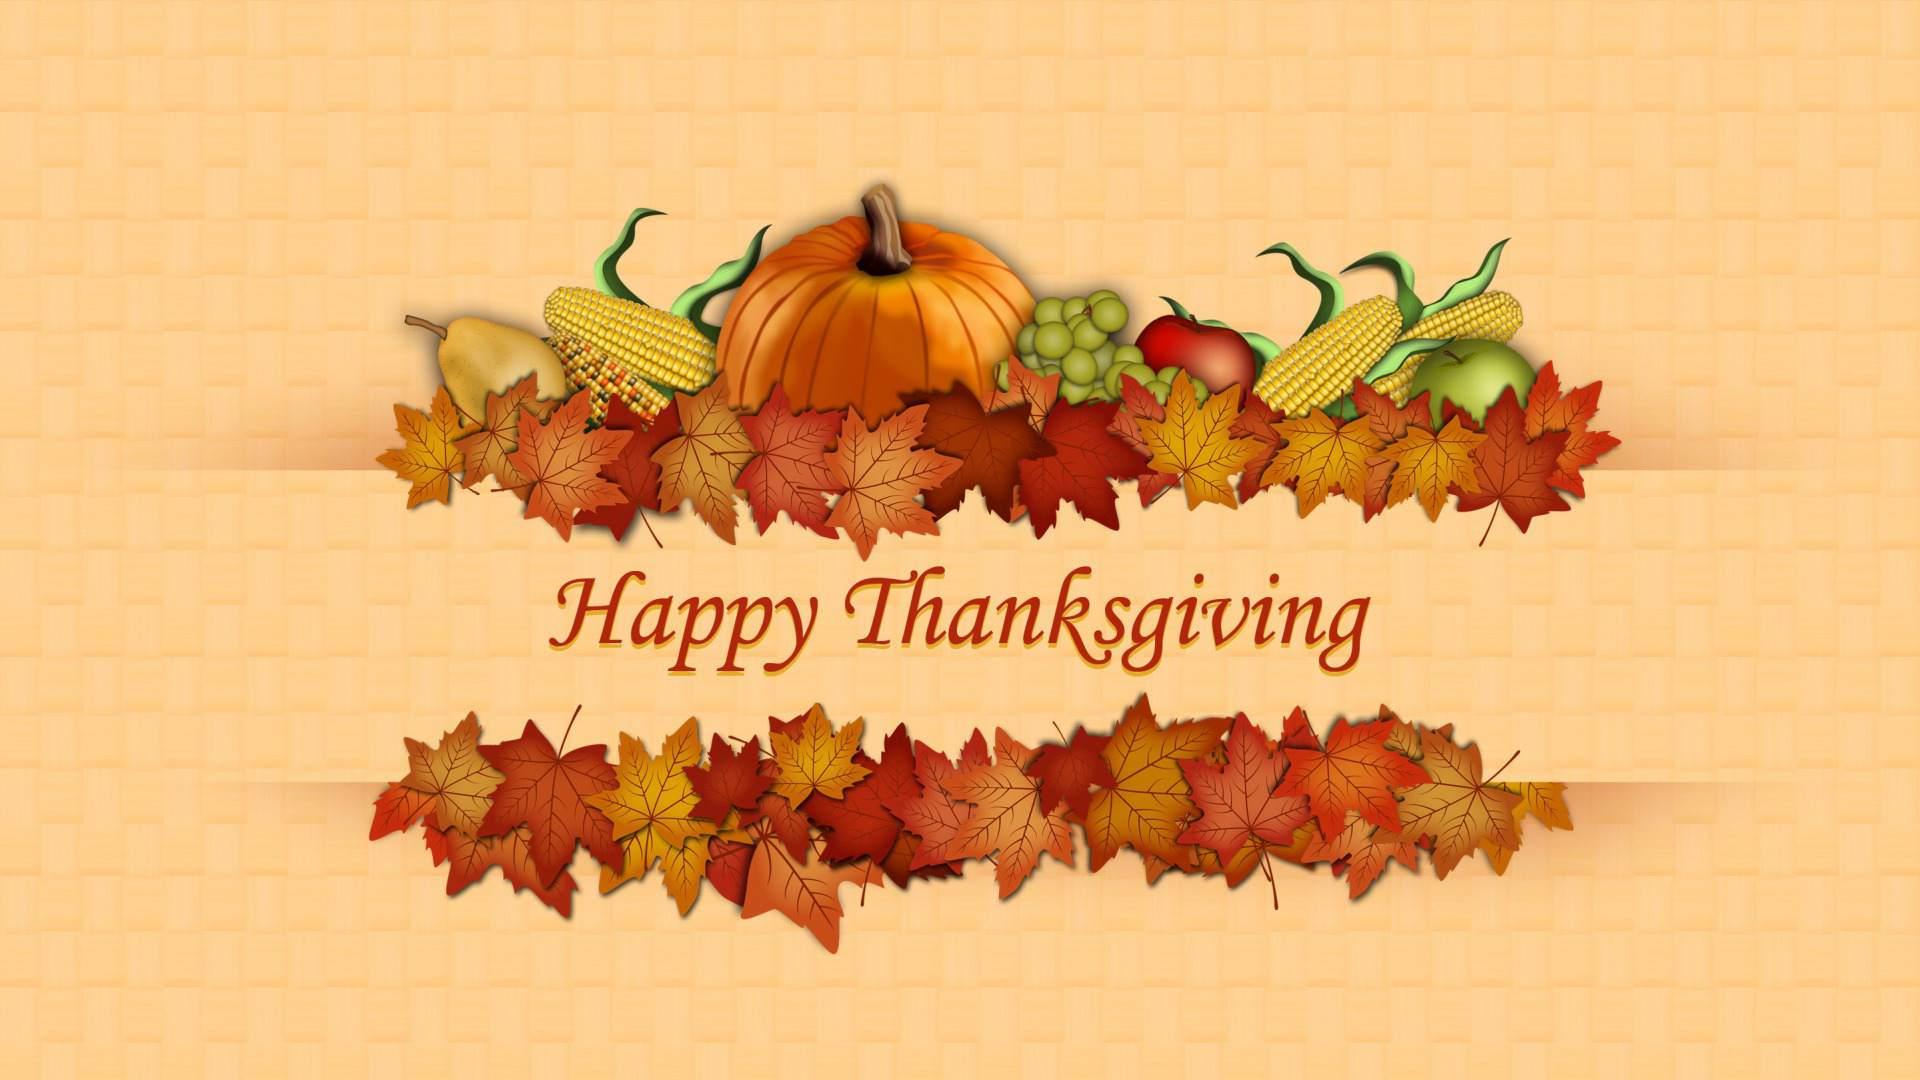 For My Desktop Thanksgiving Wallpapers   Top For My Desktop 1920x1080